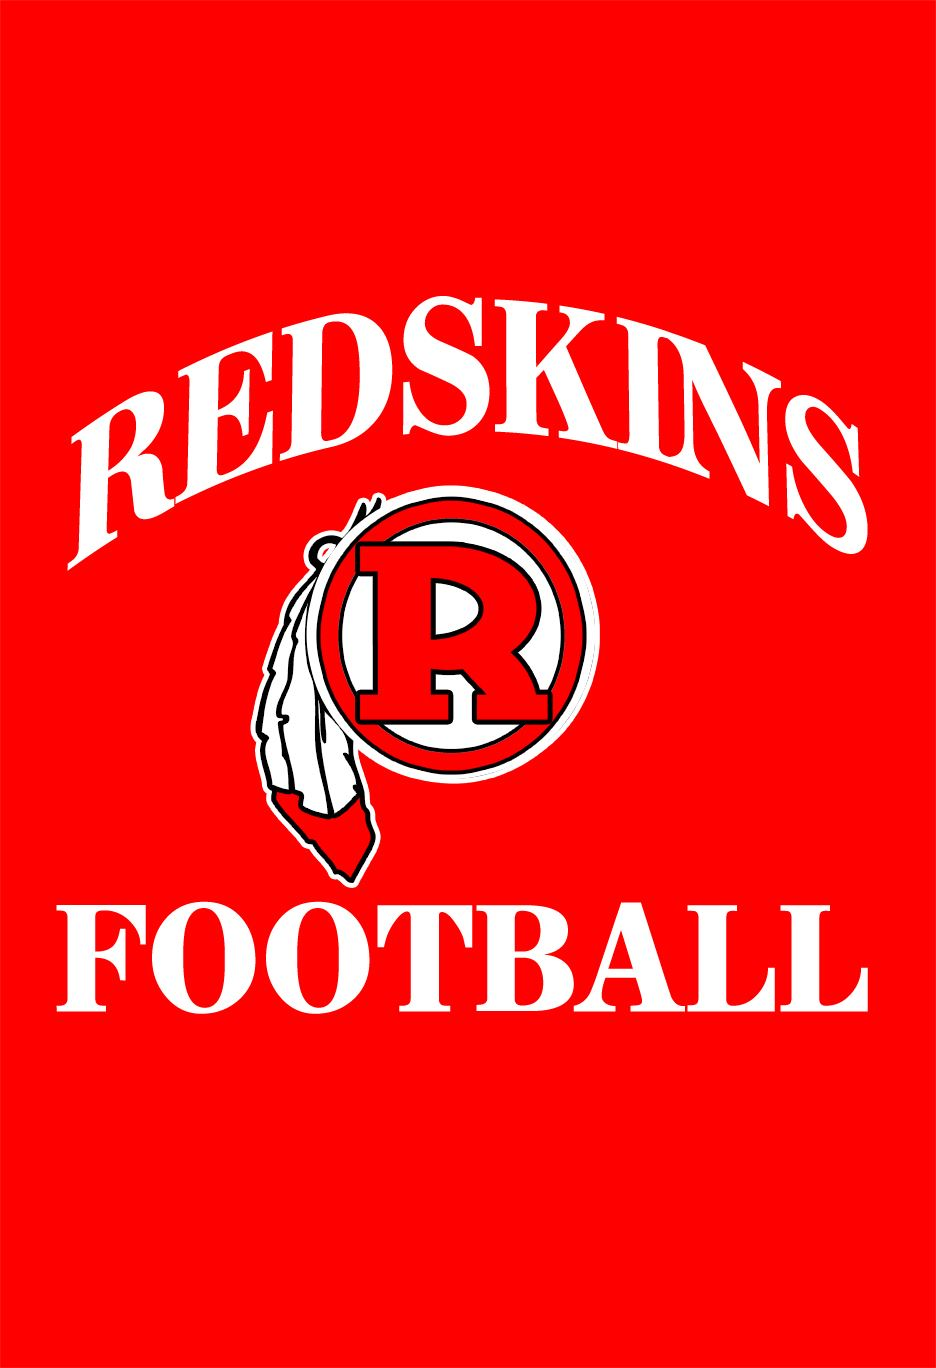 Canisteo-Greenwood High School - Jr's Football